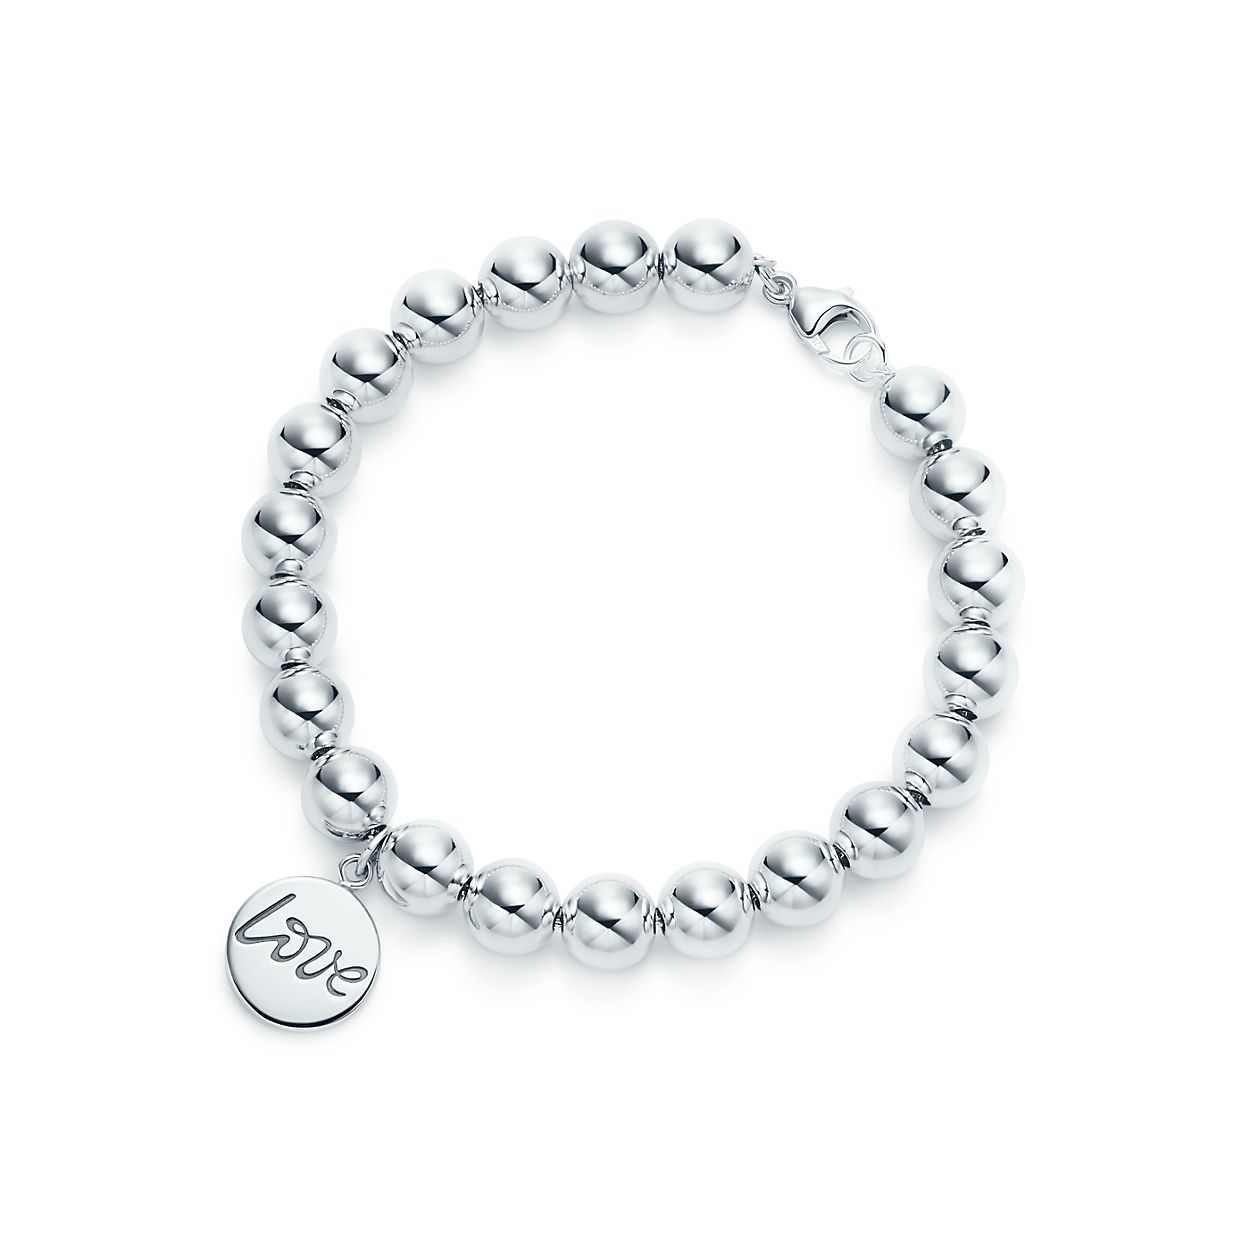 Paloma S Graffiti Love Tag Bead Bracelet